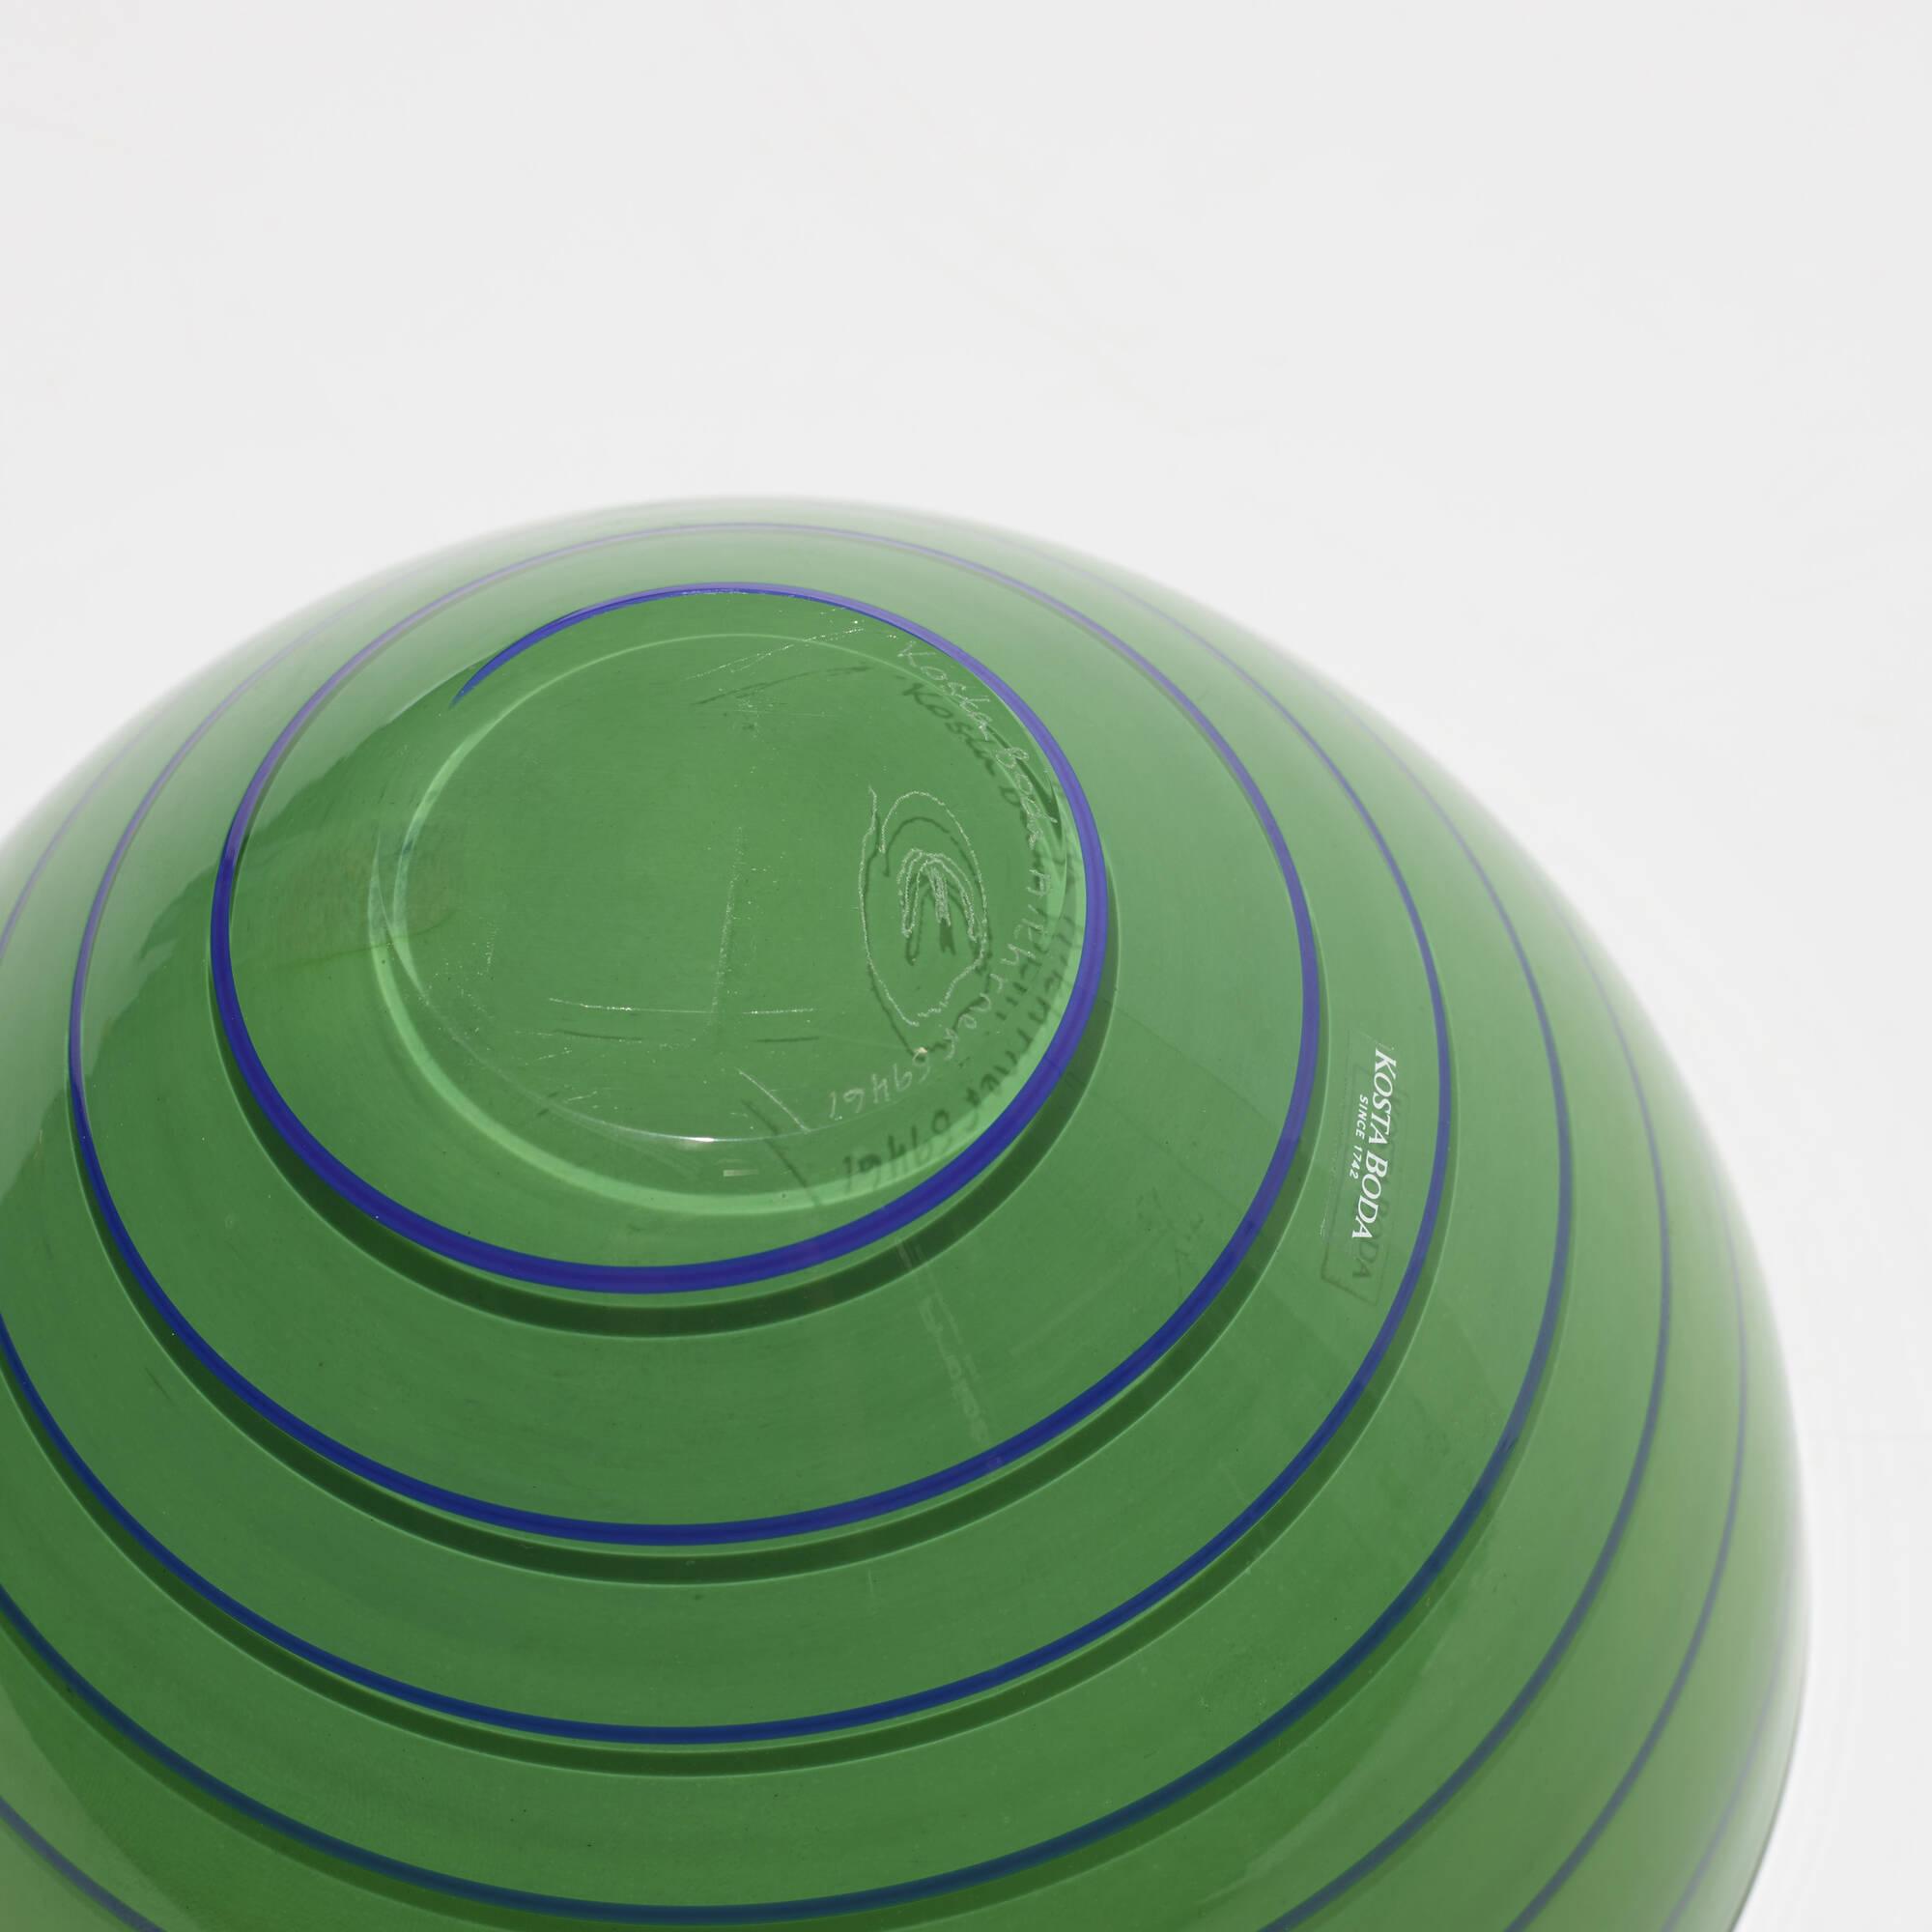 114: Anna Ehrner / bowl (3 of 3)